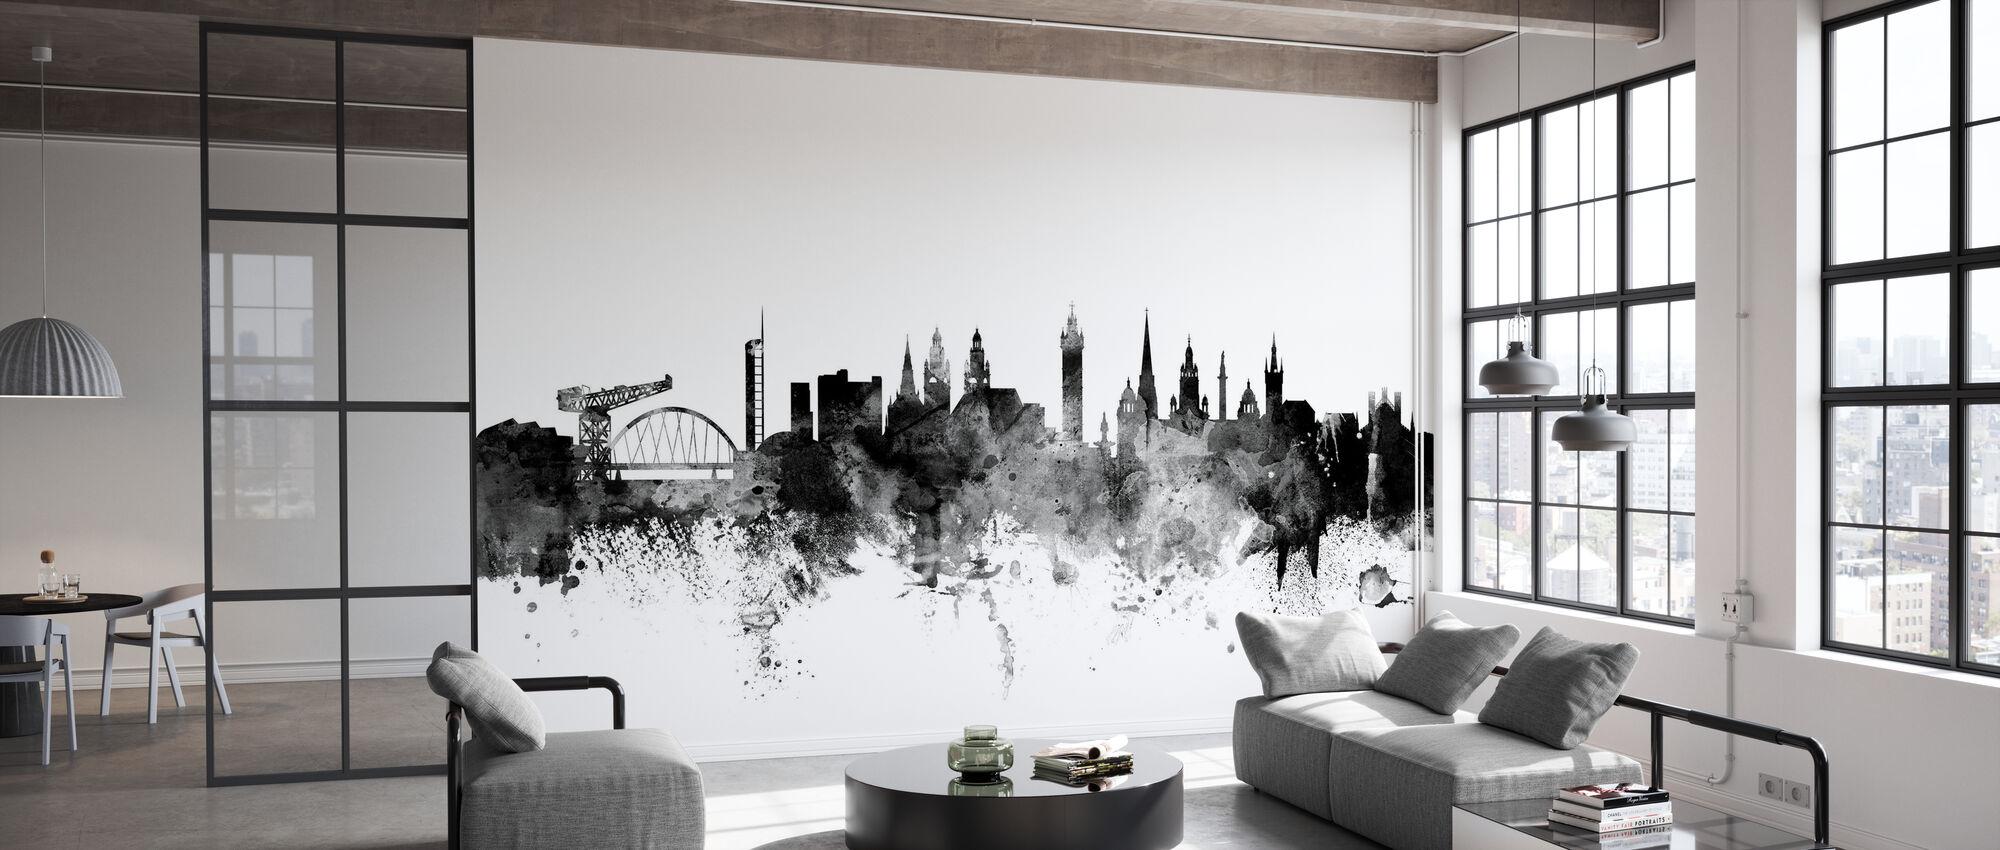 Glasgow Scotland Skyline Black - Wallpaper - Office